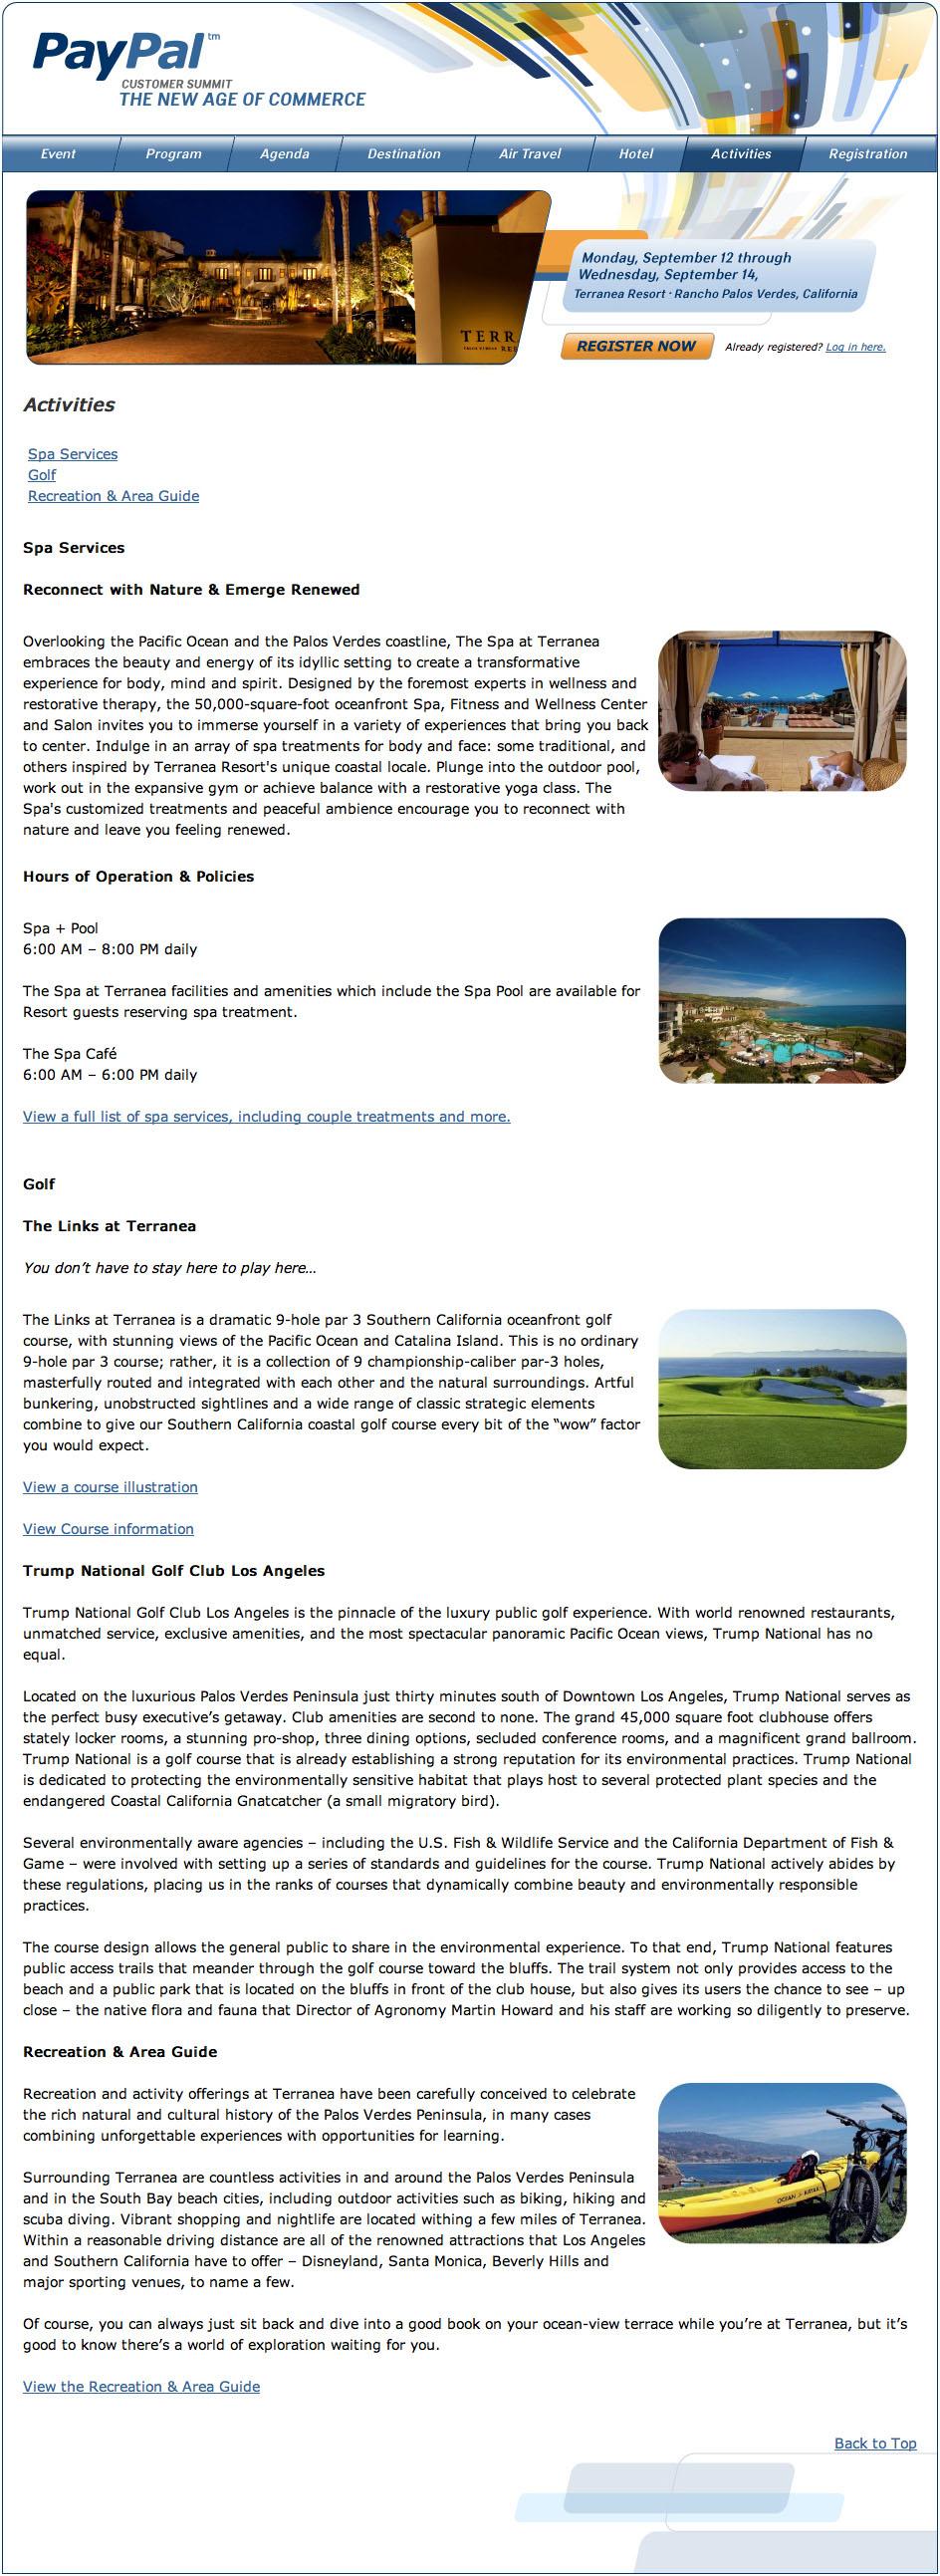 PayPal_Customer_Summit_Website_7.jpg